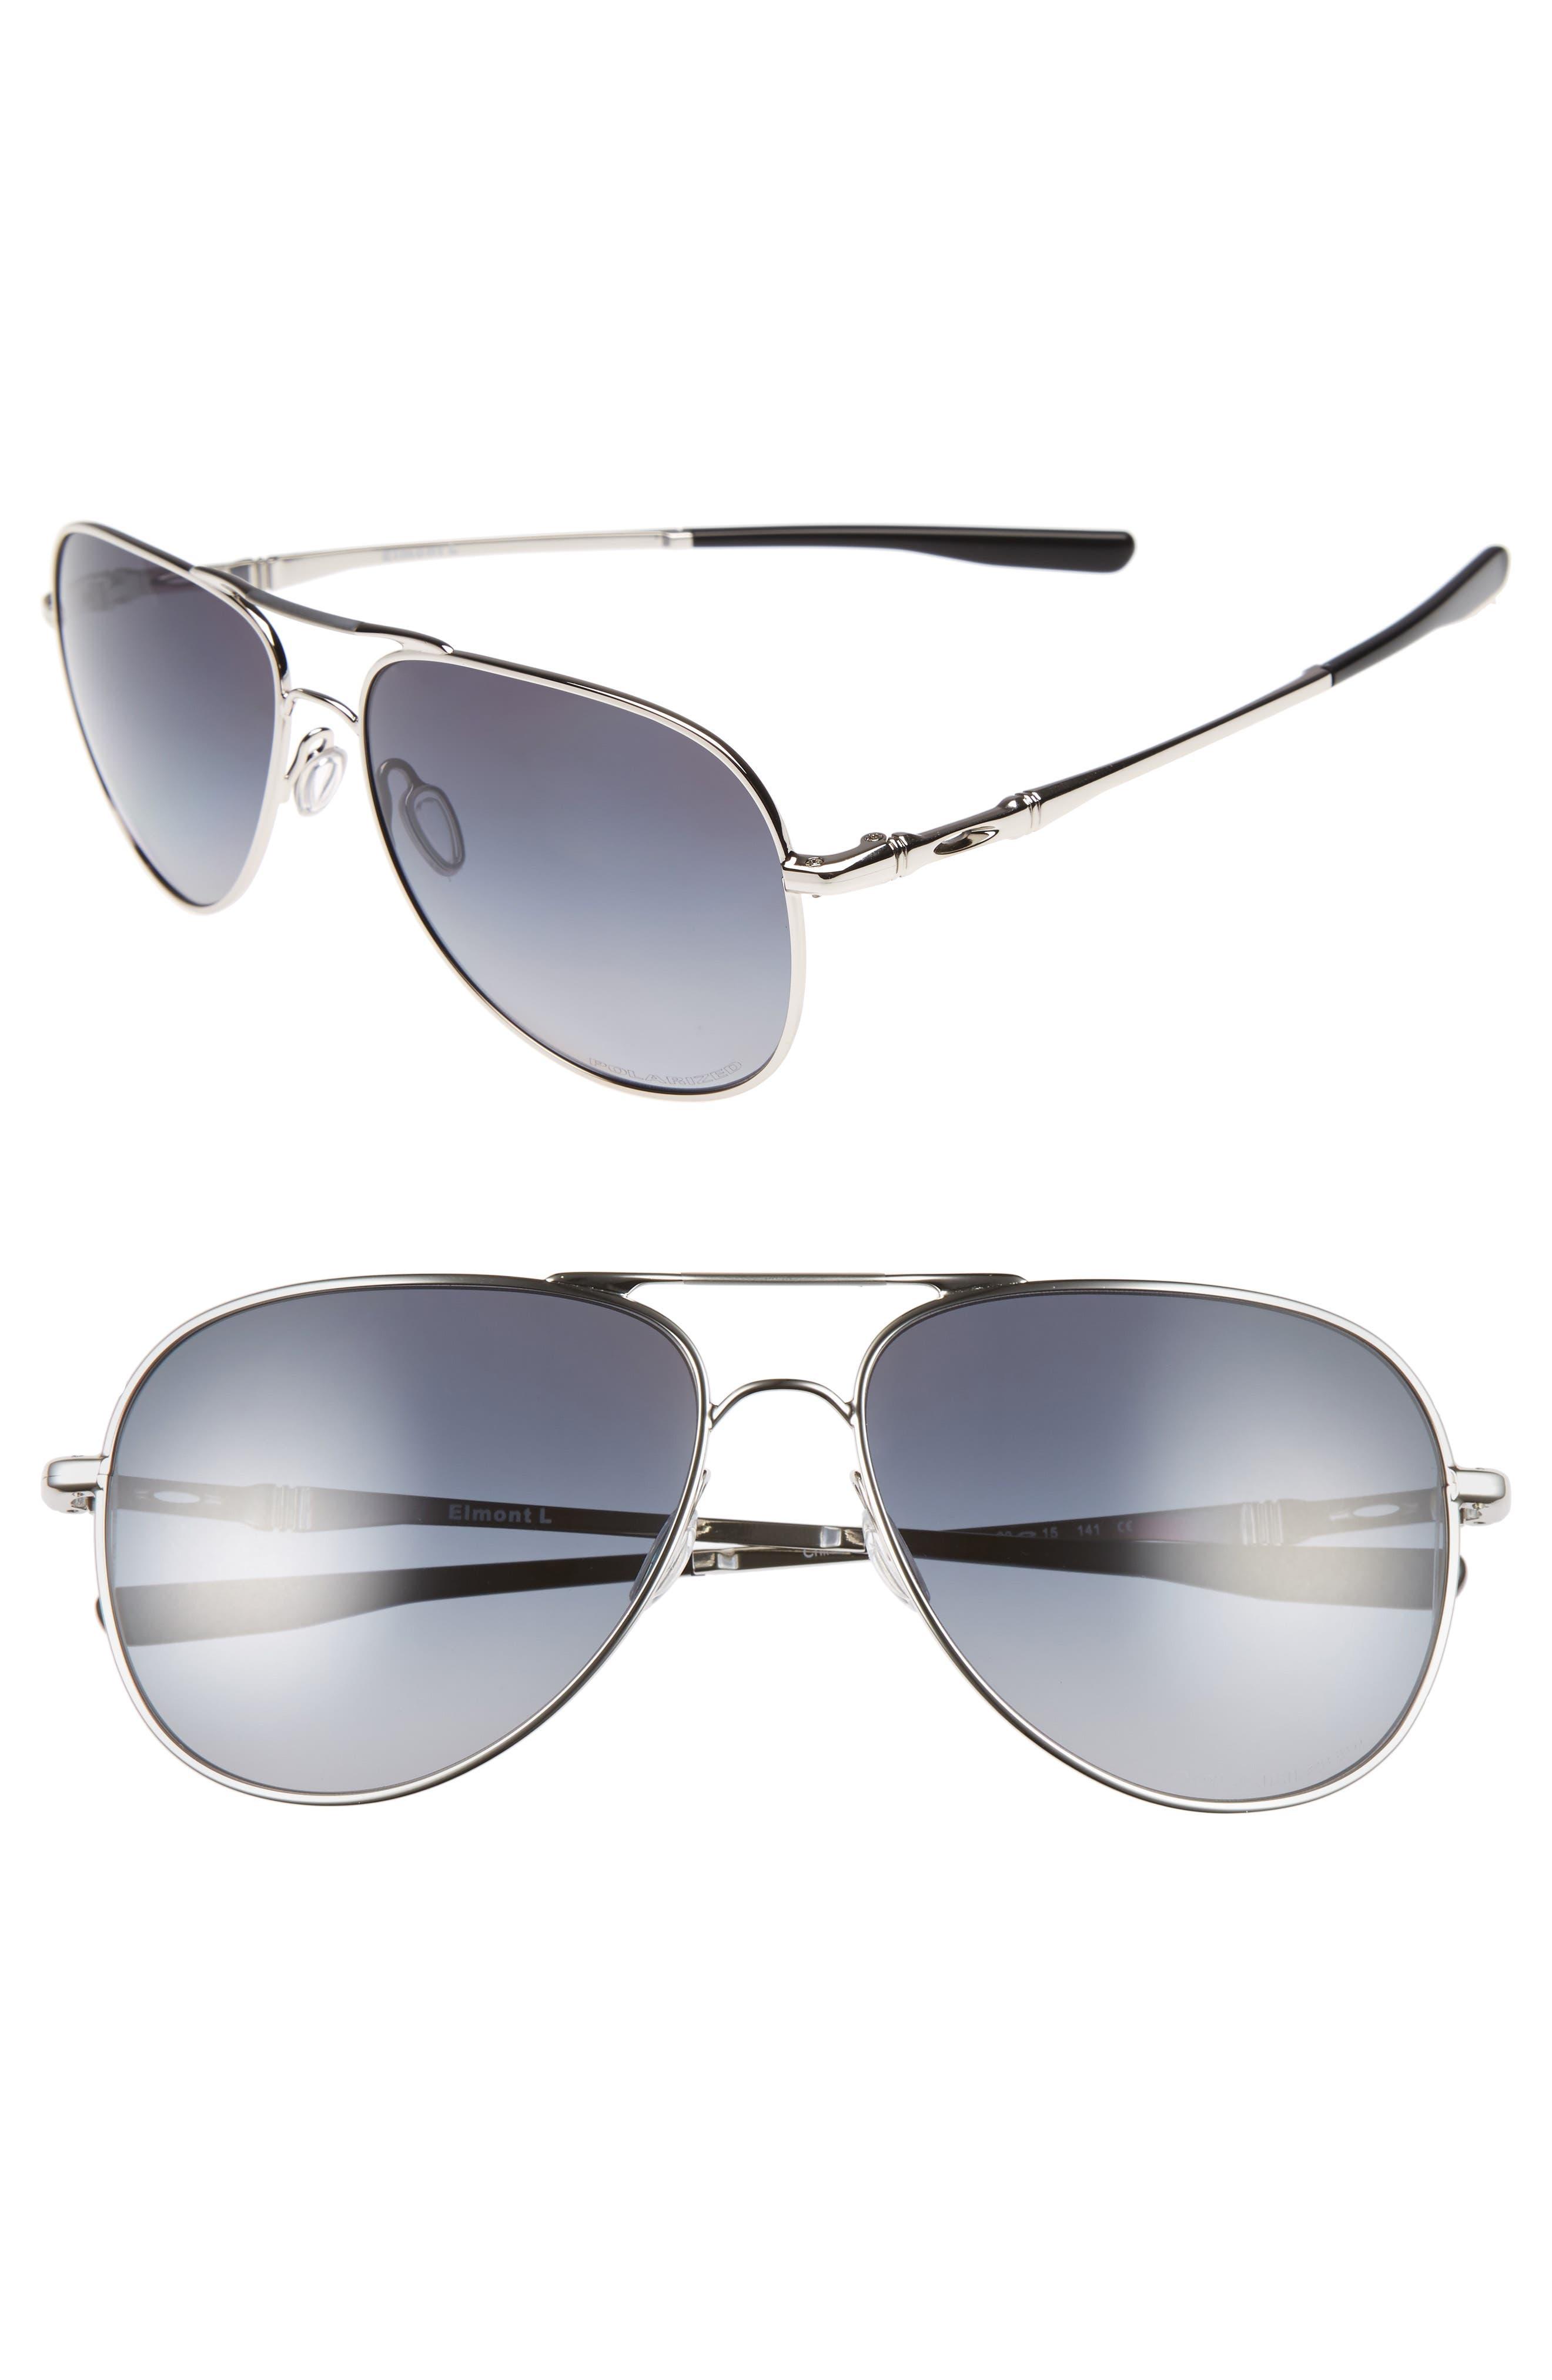 Elmont 61mm Polarized Aviator Sunglasses,                         Main,                         color, Silver